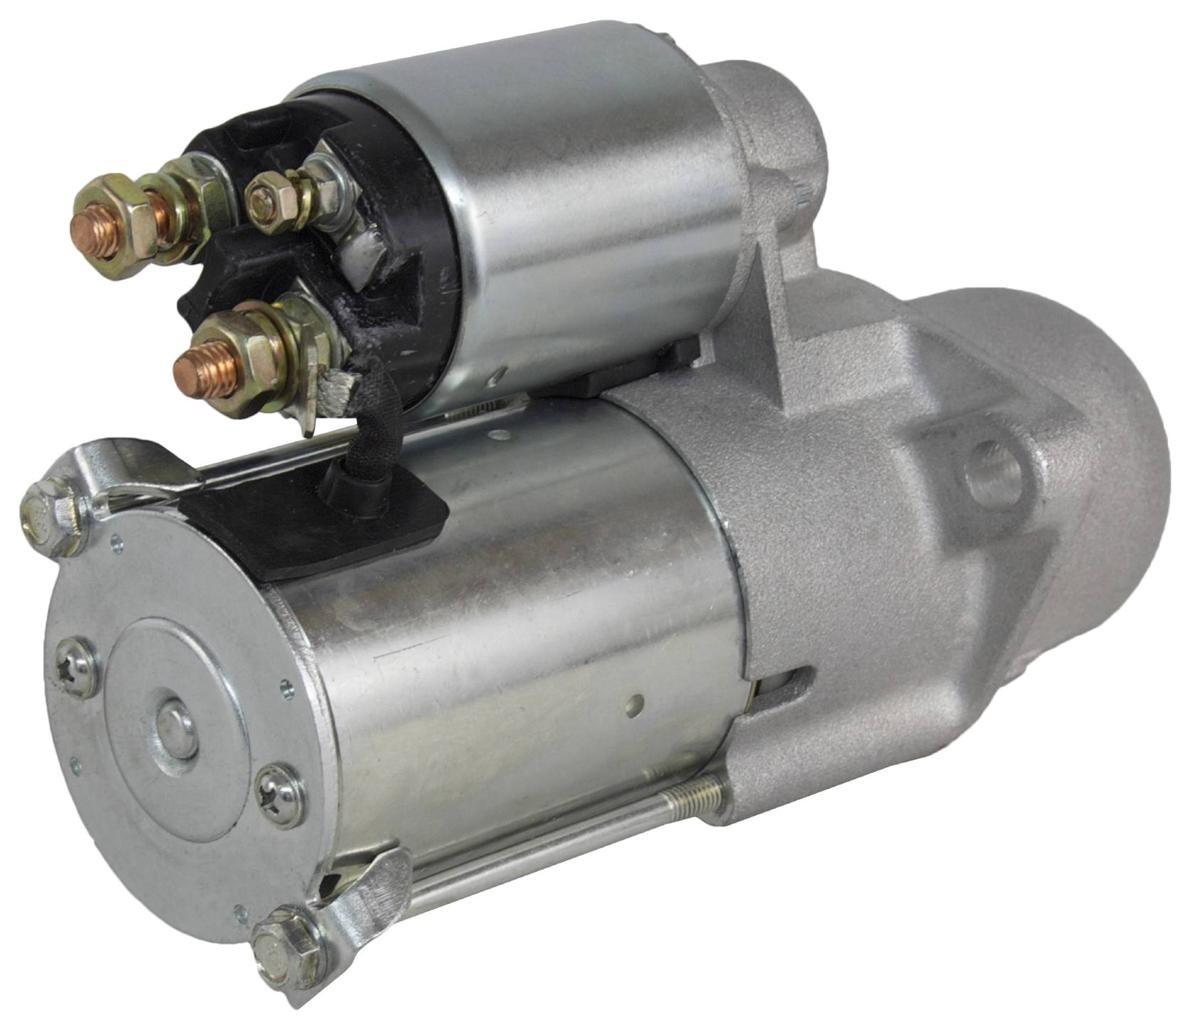 New Starter Motor Fits Pontiac G6 4 Cyl 24l 2007 323 1998 Saturn Location 1642 3231642 8000079 89018113 12596233 Automotive